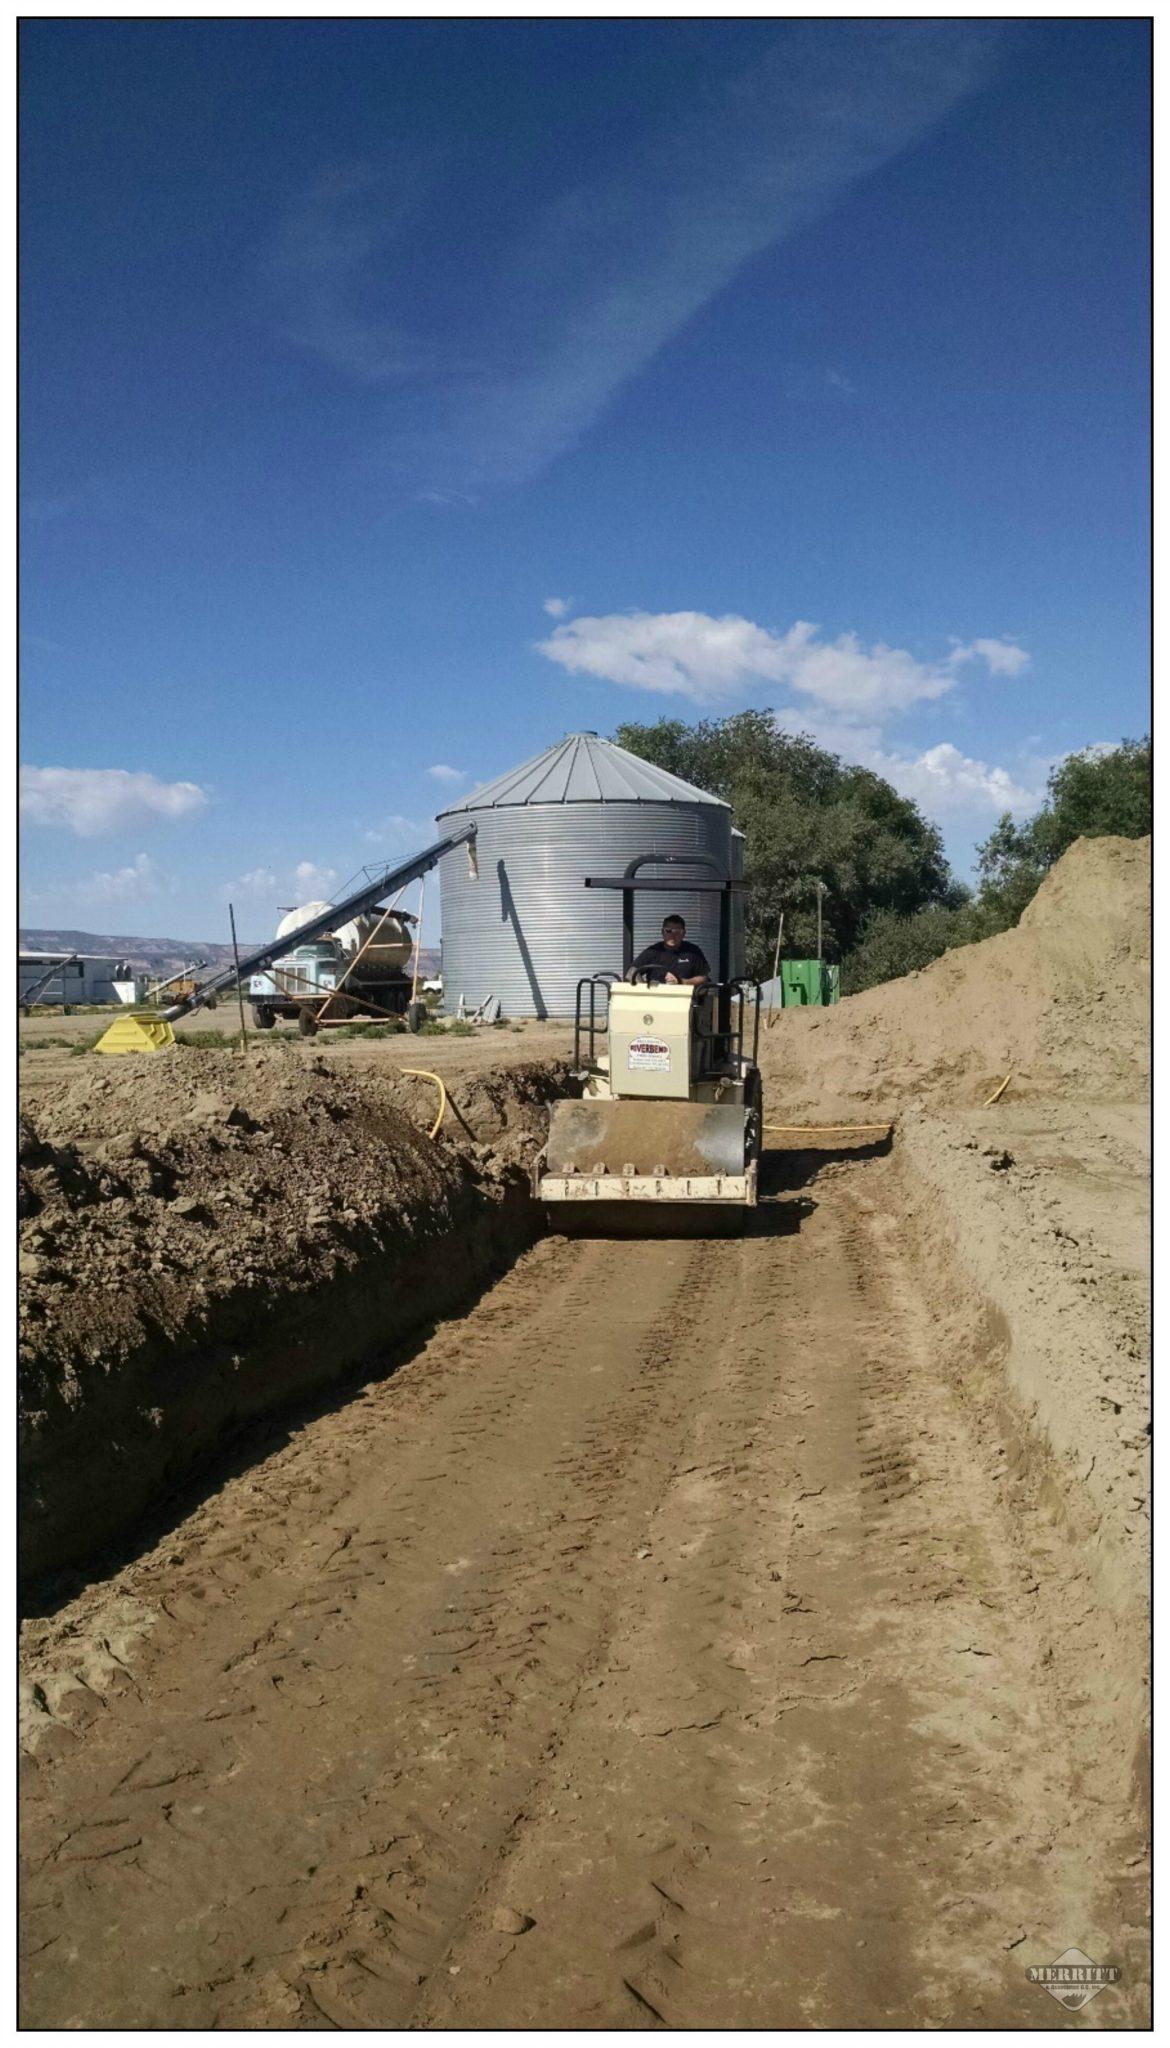 Excavation by Merritt and Associates G.C. Inc.